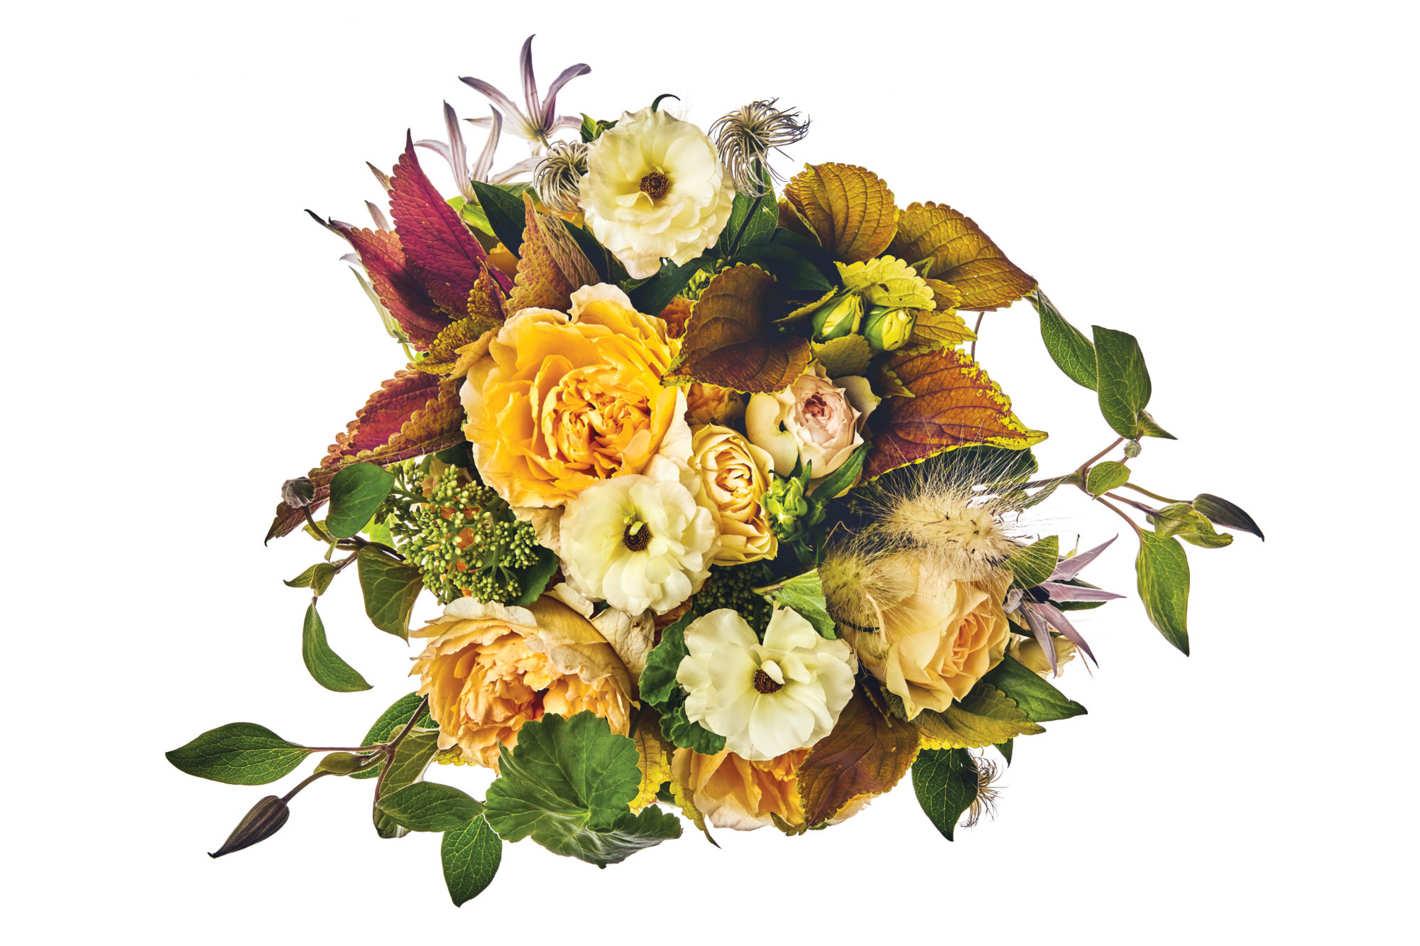 Garden rose, Butterfly ranunculus, clematis, coleus, bunny grass, and geranium foliage